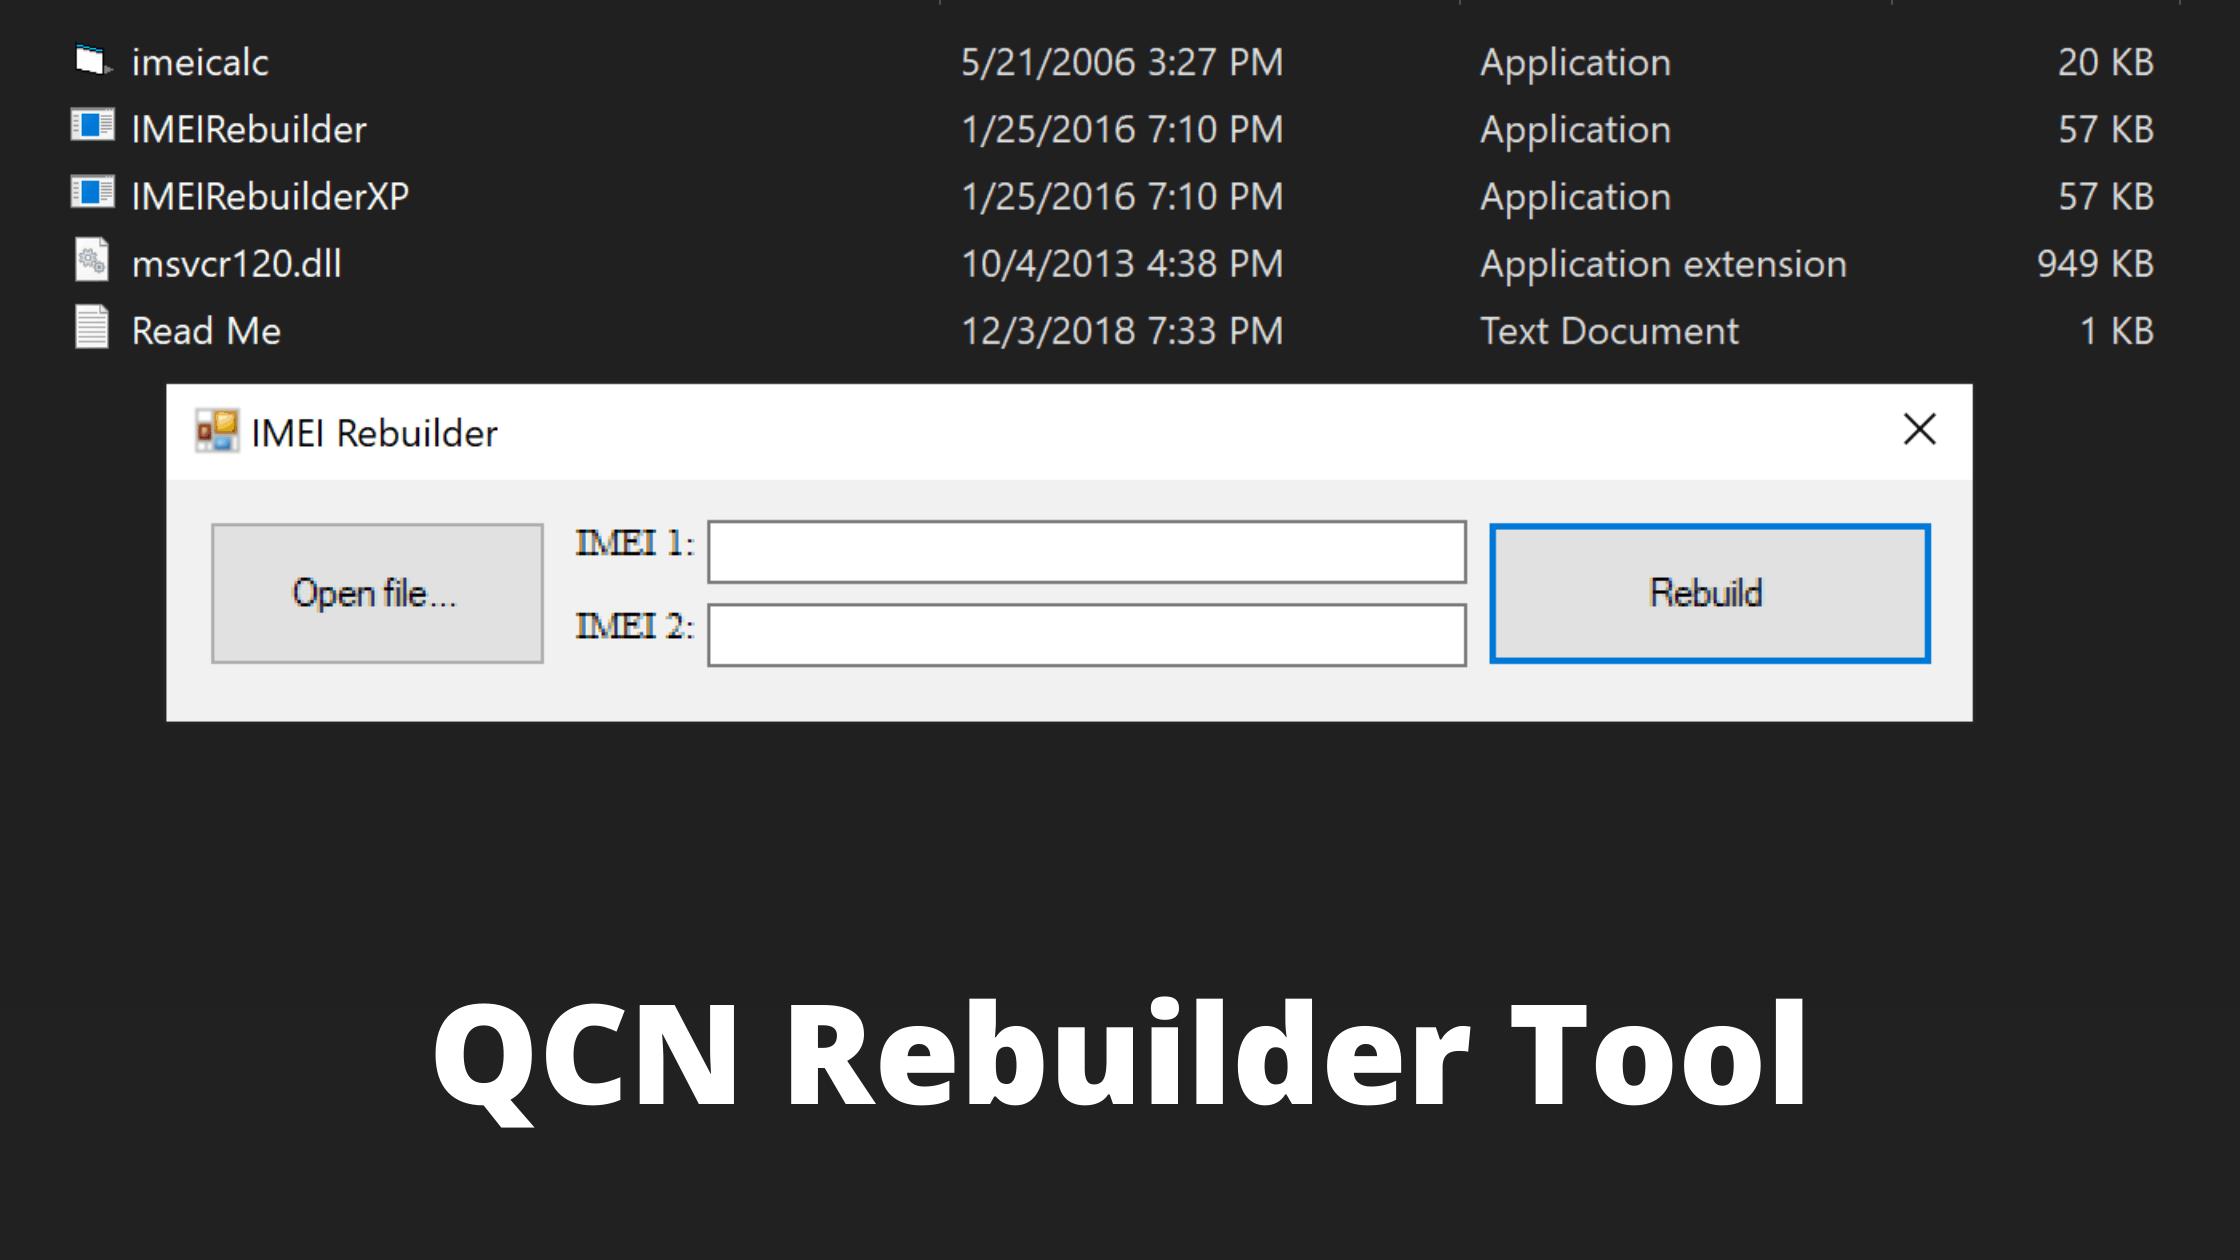 Download QCN Rebuilder Tool latest Version